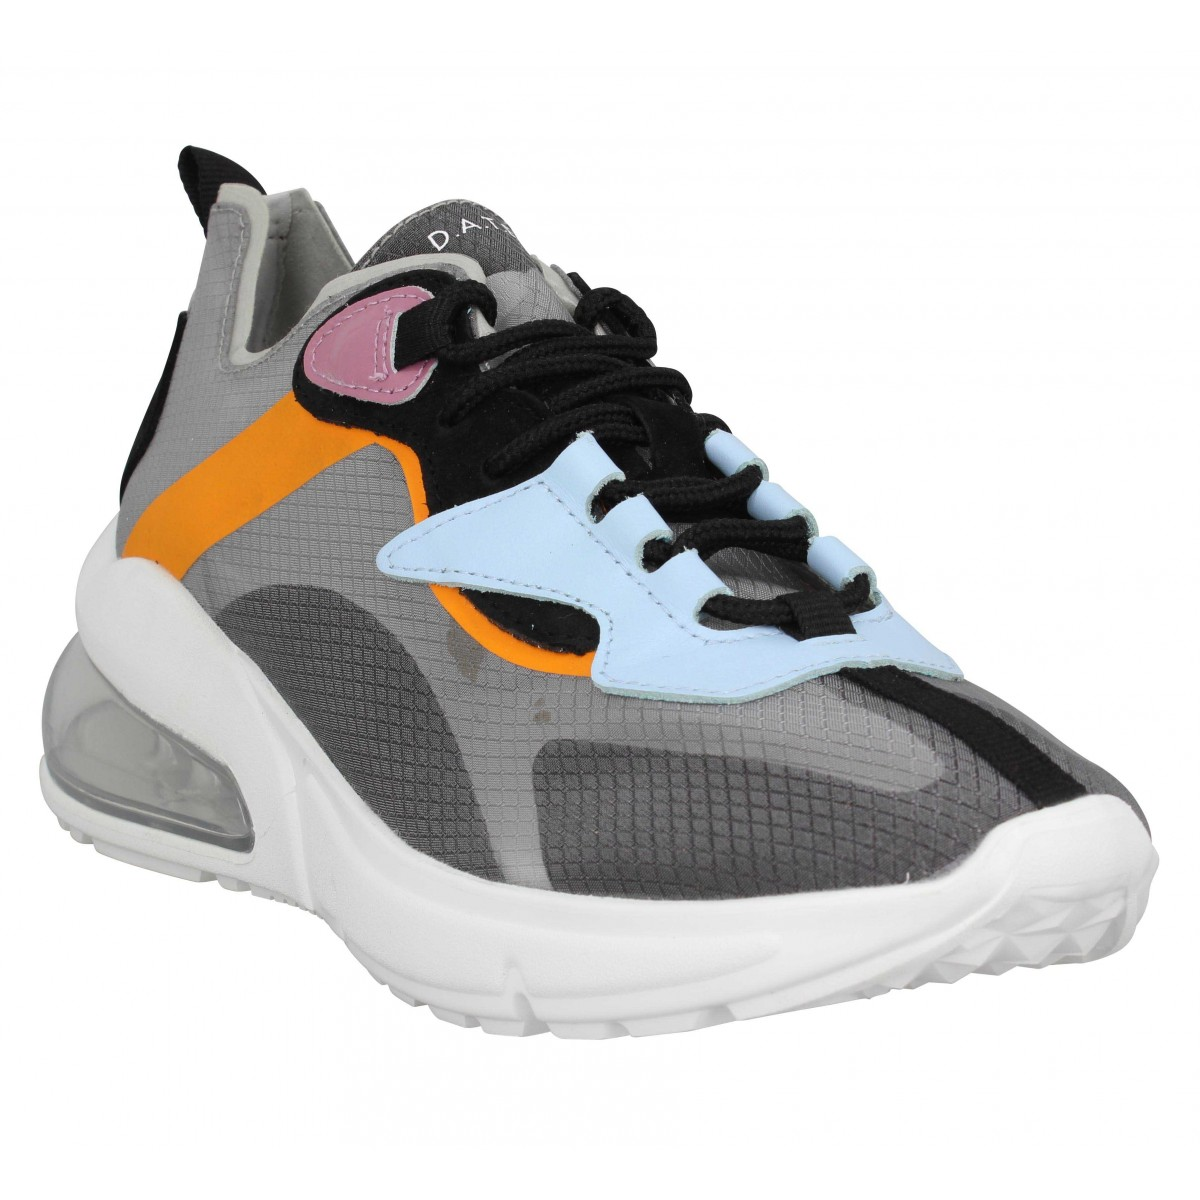 D.A.T.E Marque Date Sneakers Aura Honey...